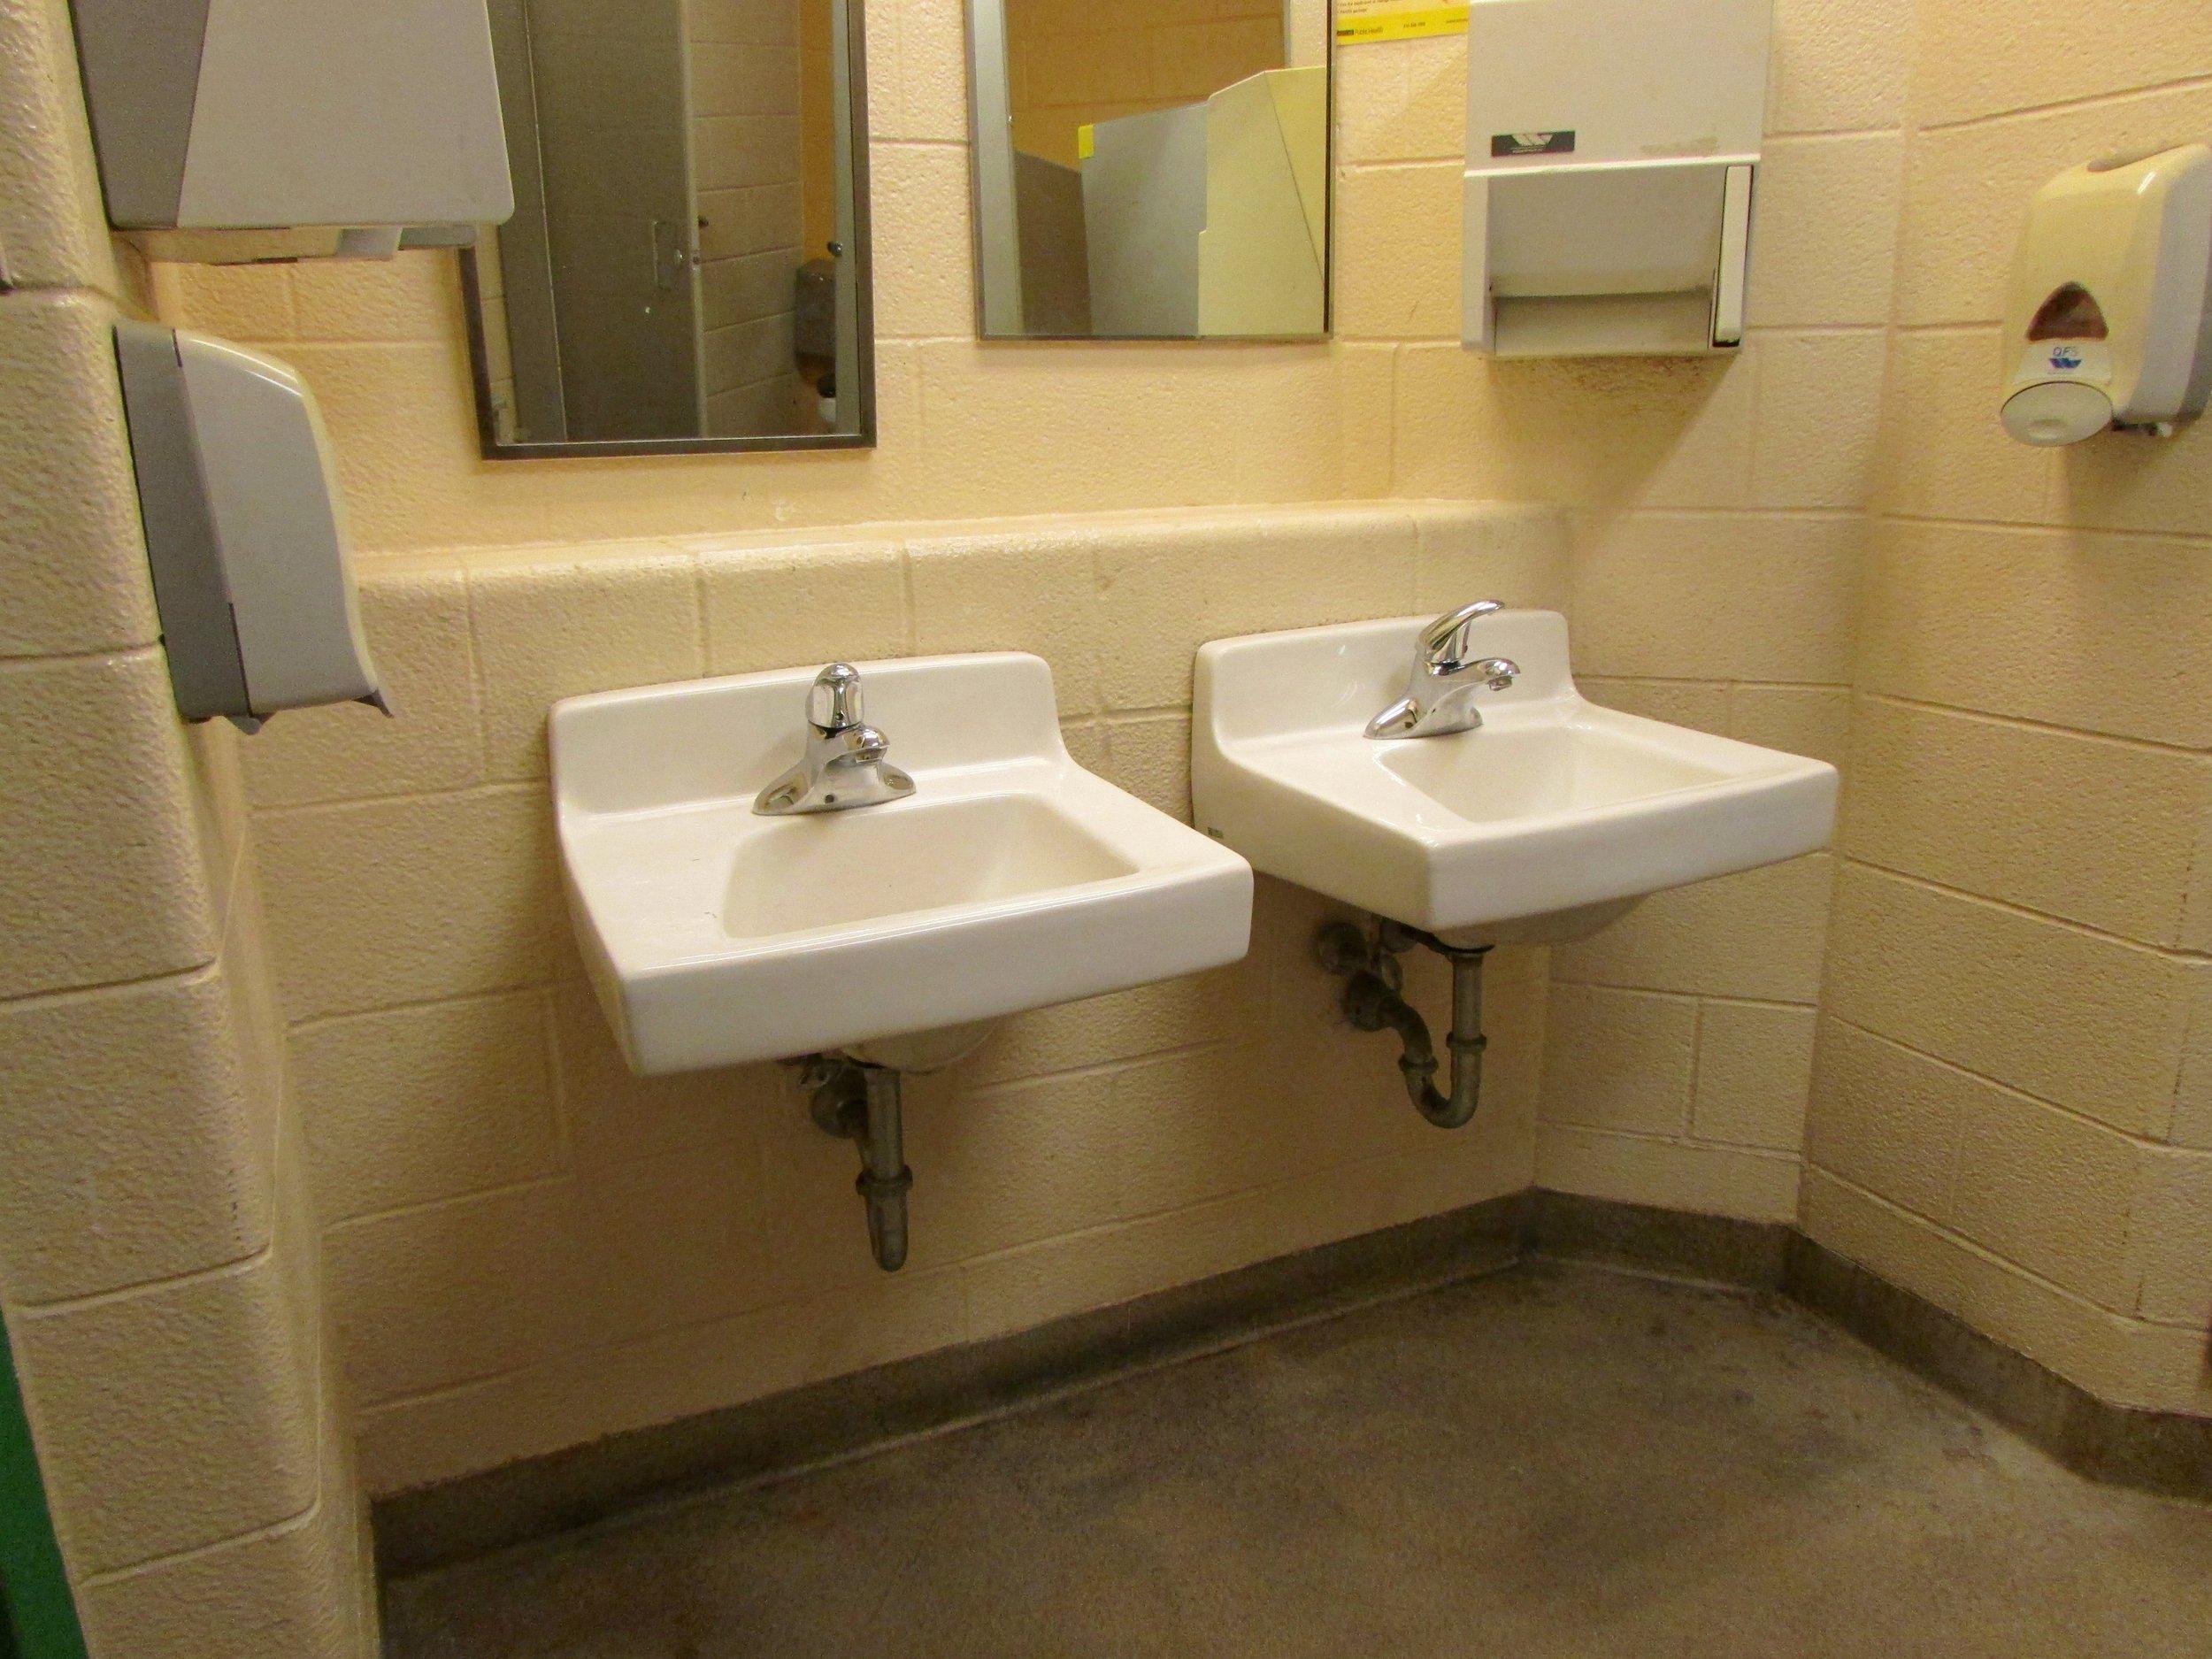 Sinks in Fine Arts Centre washroom